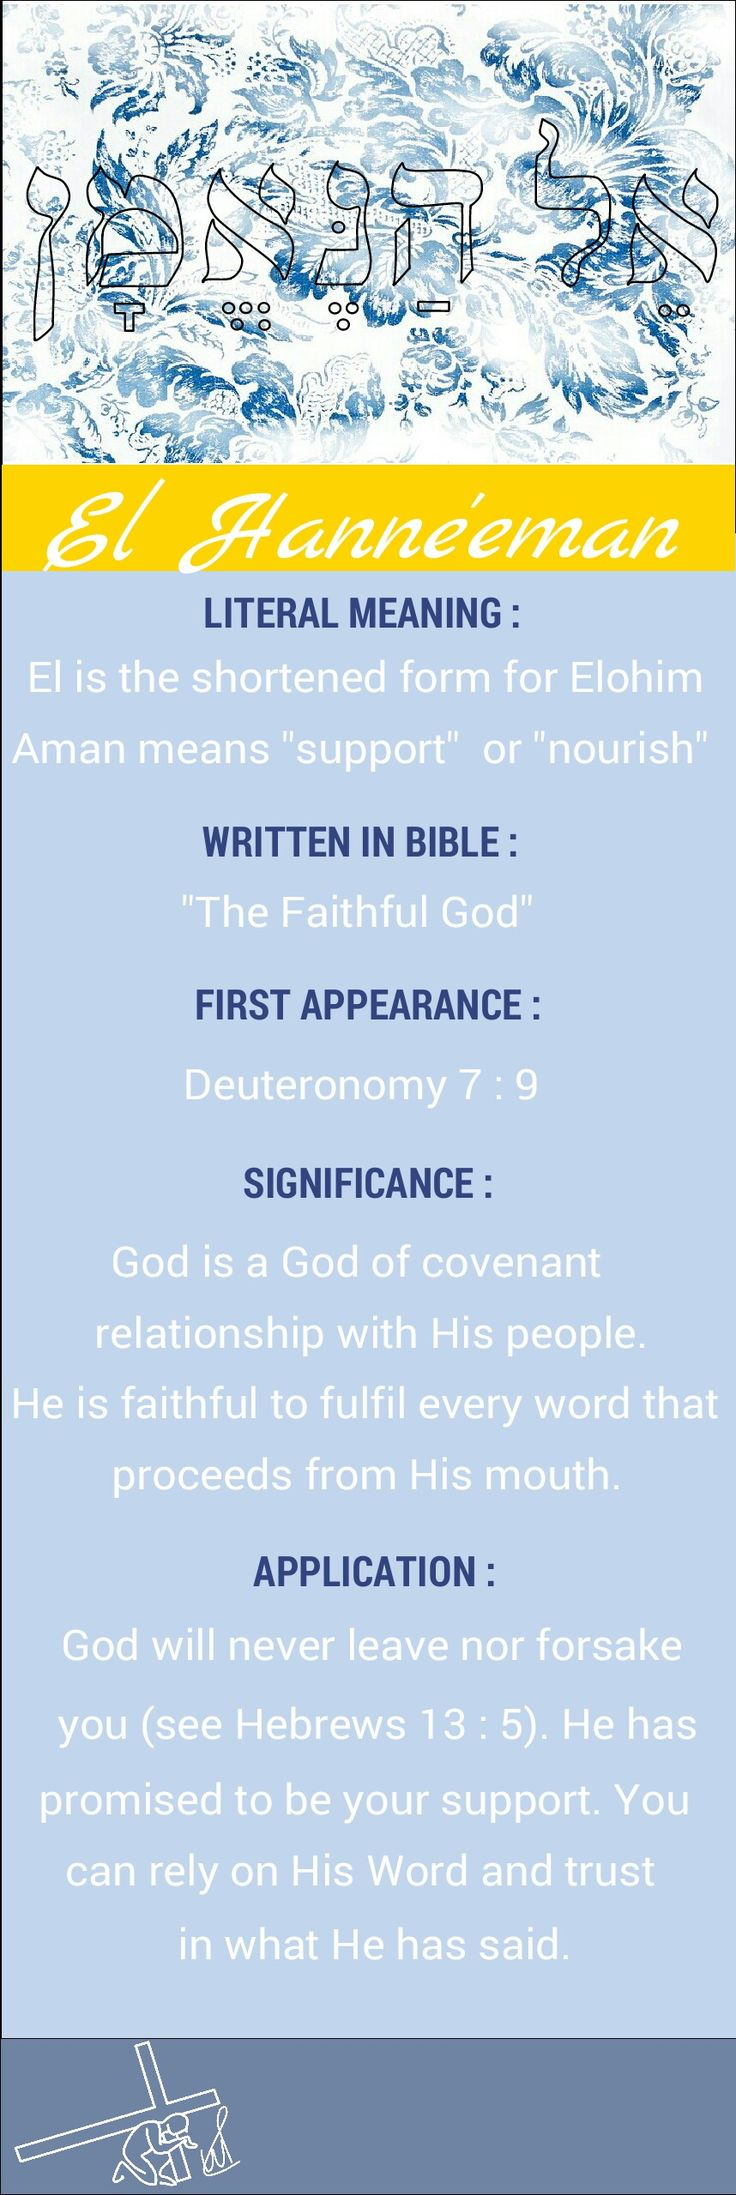 Names of God El Hanne'eman The Faithful God